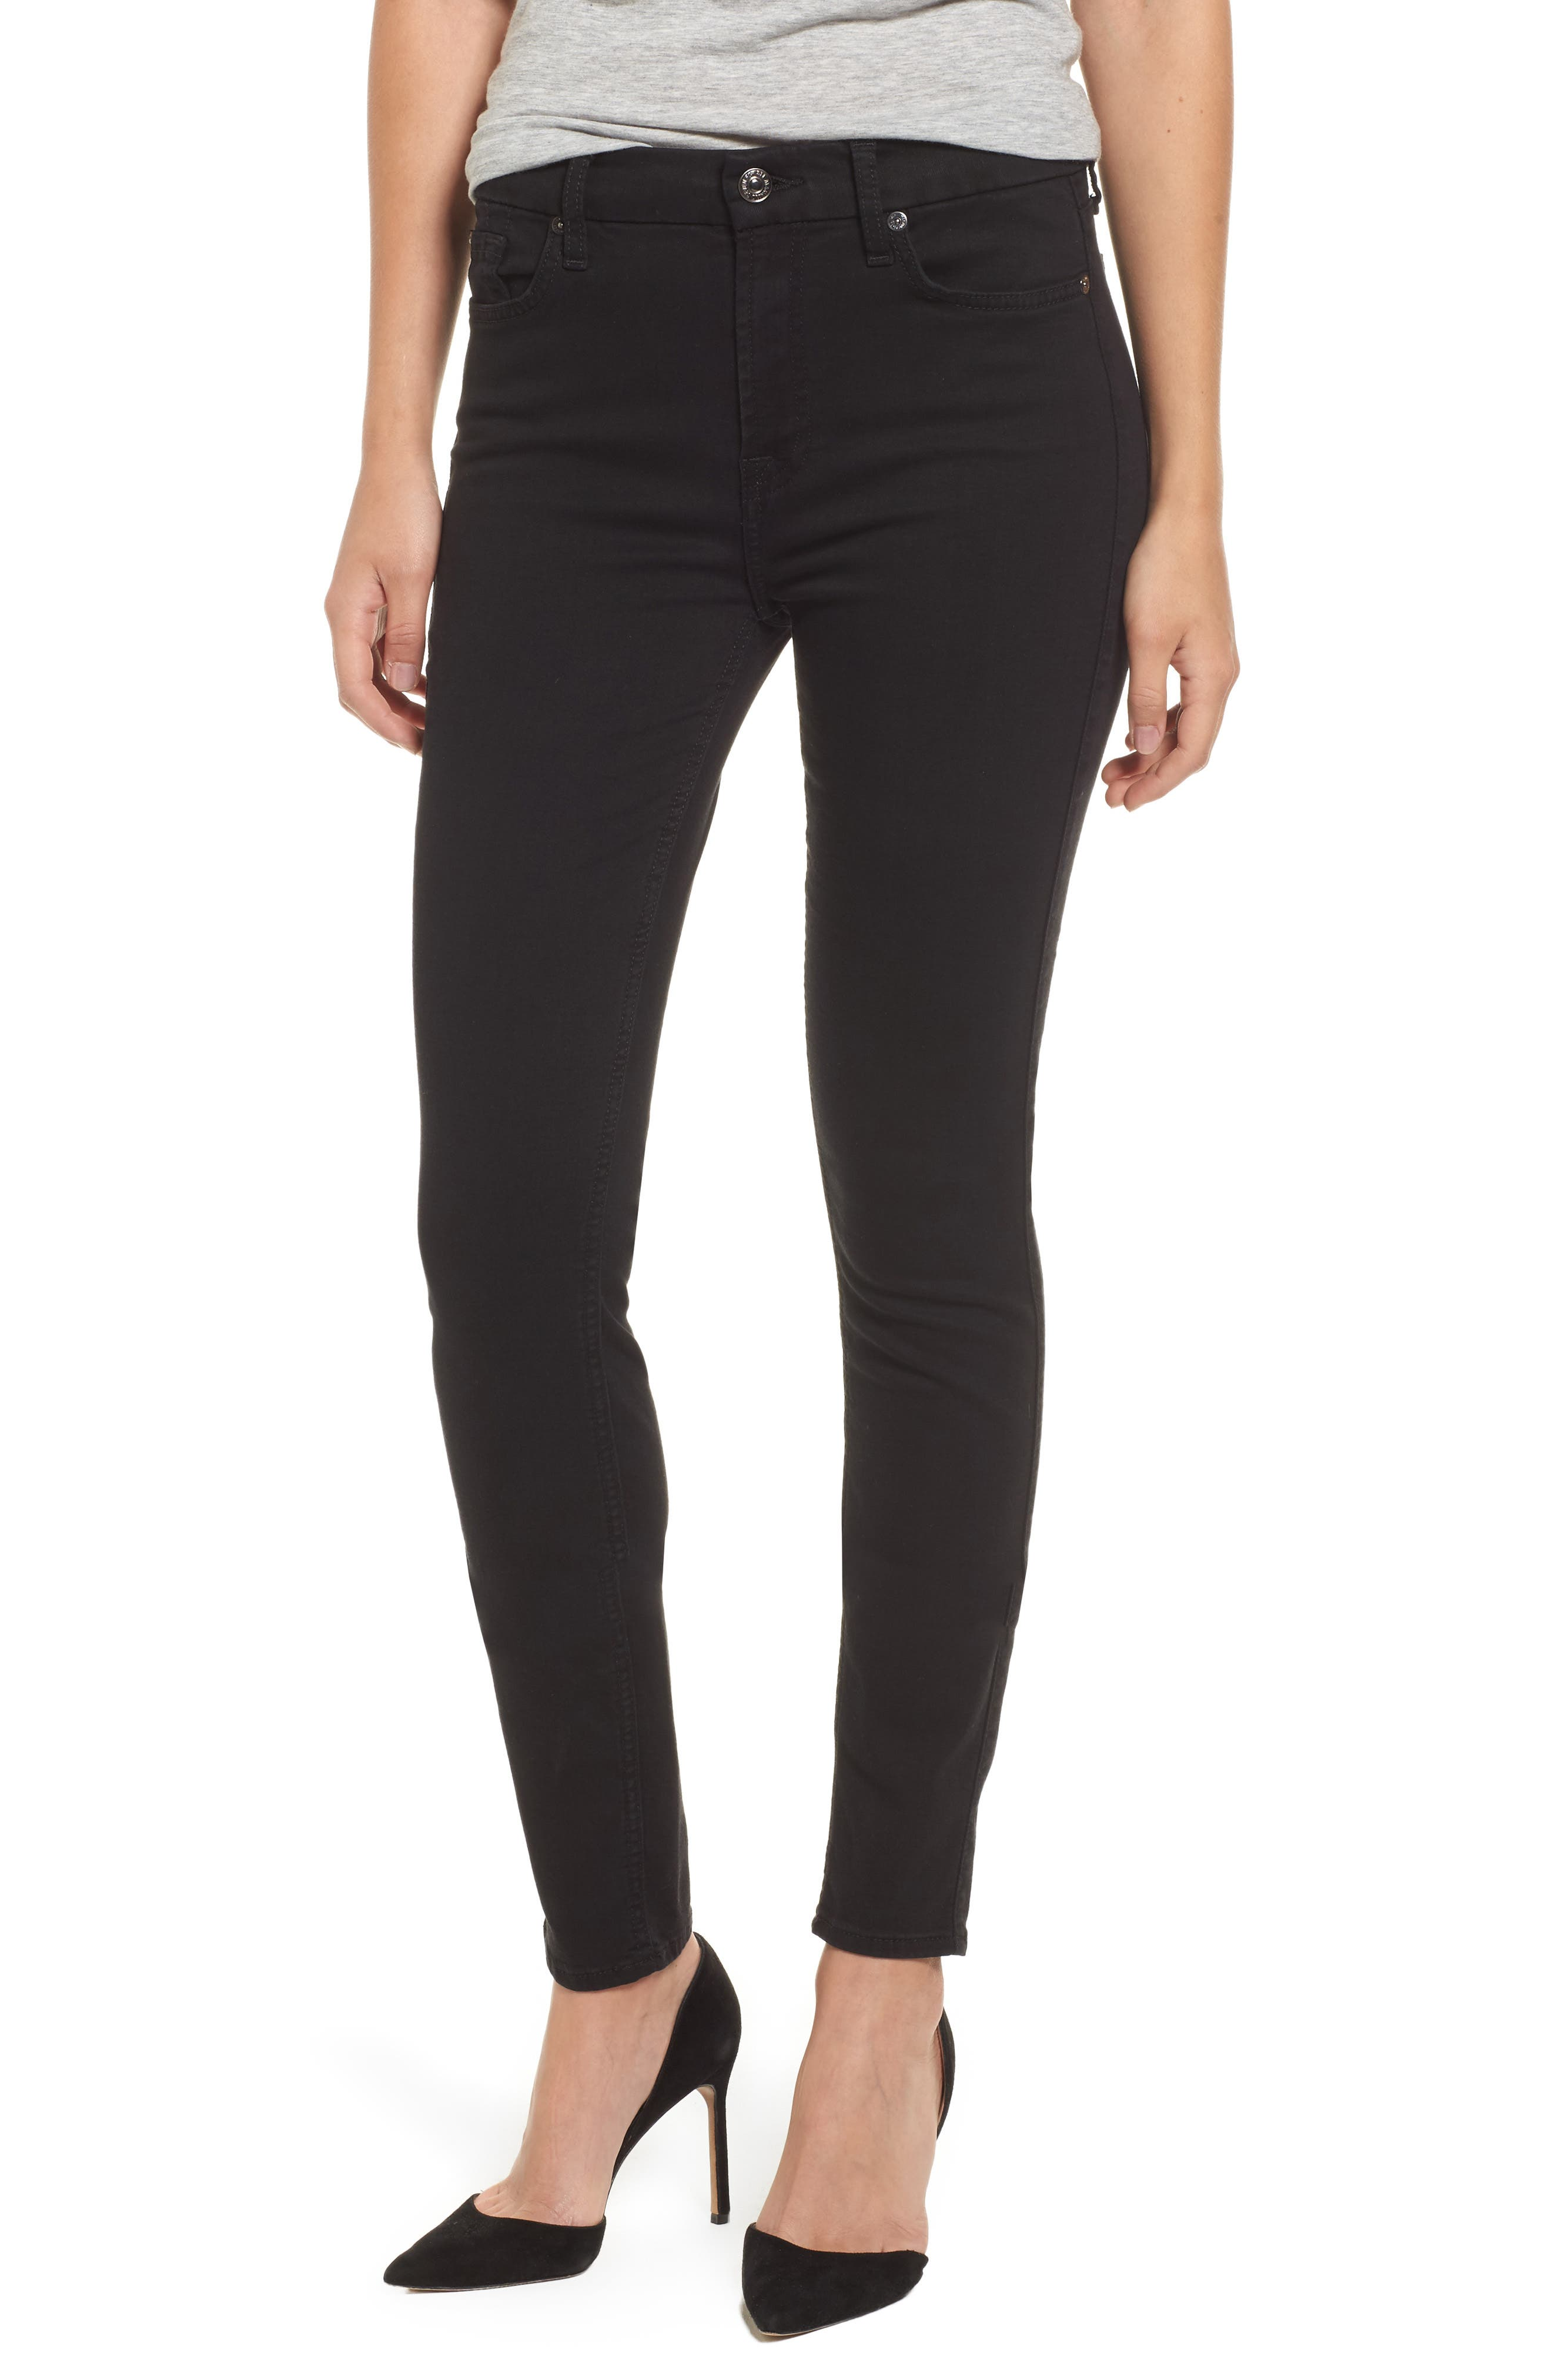 b(air) High Waist Skinny Jeans,                         Main,                         color, B(AIR) BLACK